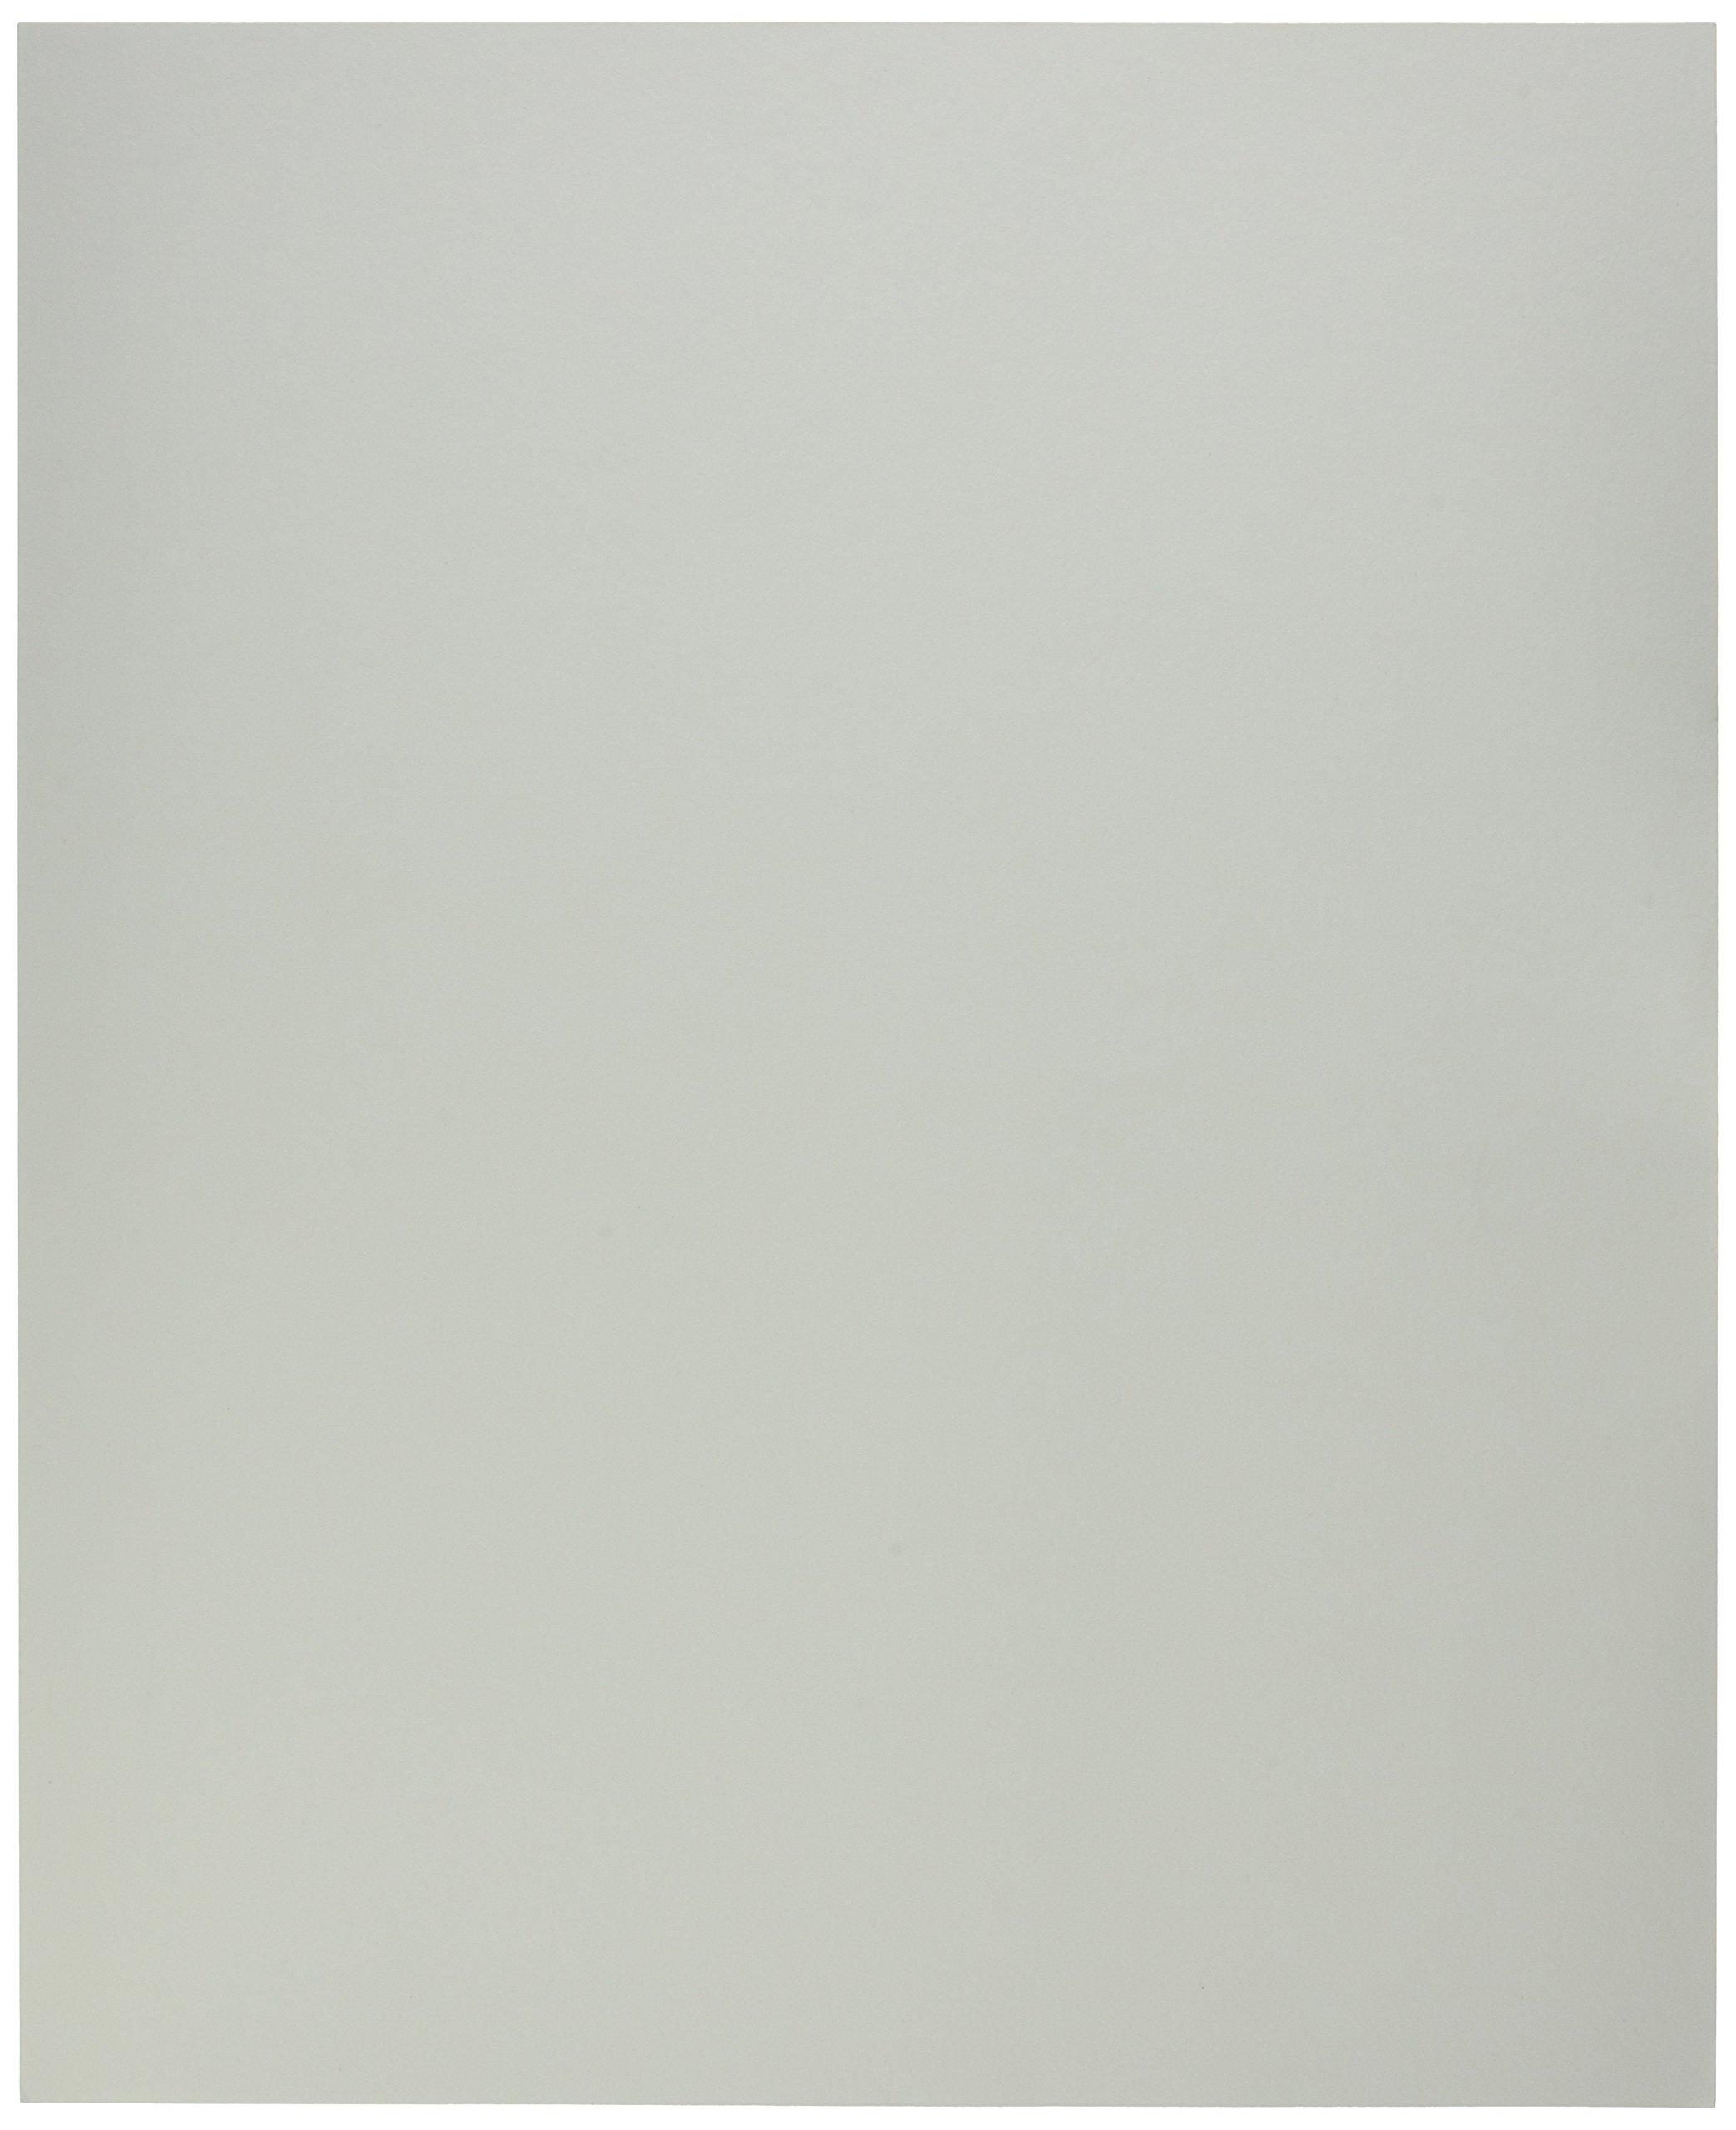 GE Whatman 3030-347 Chr Cellulose Chromatography Paper Sheet, 29psi Dry Burst, 130mm/30min Flow Rate, 43cm Length x 35cm Width, Grade 3MM (Pack of 100)